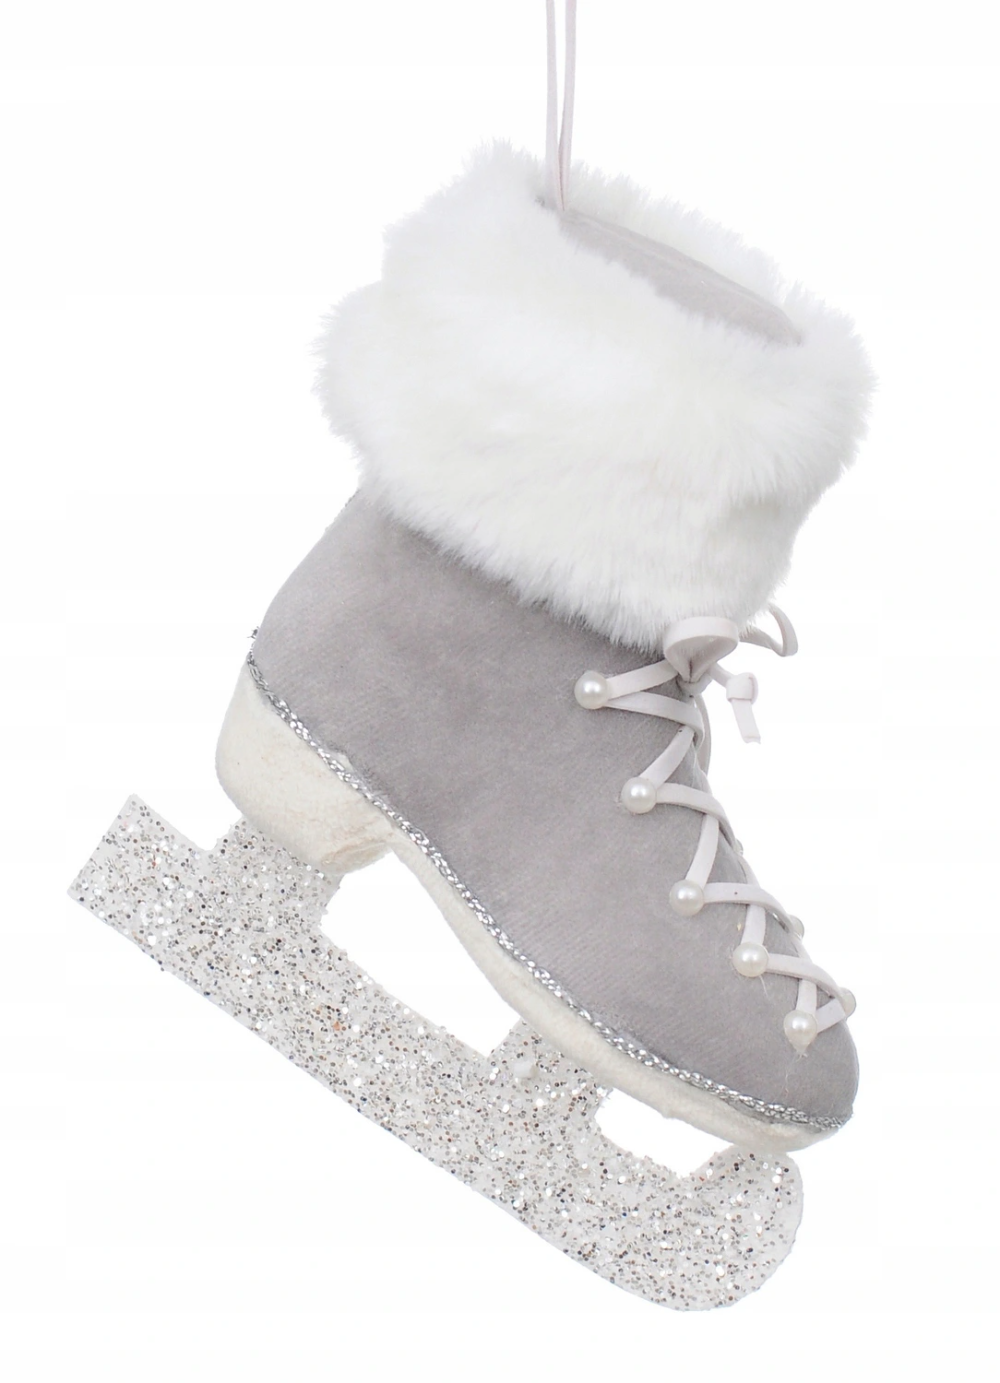 Bombki Choinkowe 5 Szt Na Choinke Welur Szare 9840190754 Allegro Pl Boots Winter Boot Fashion